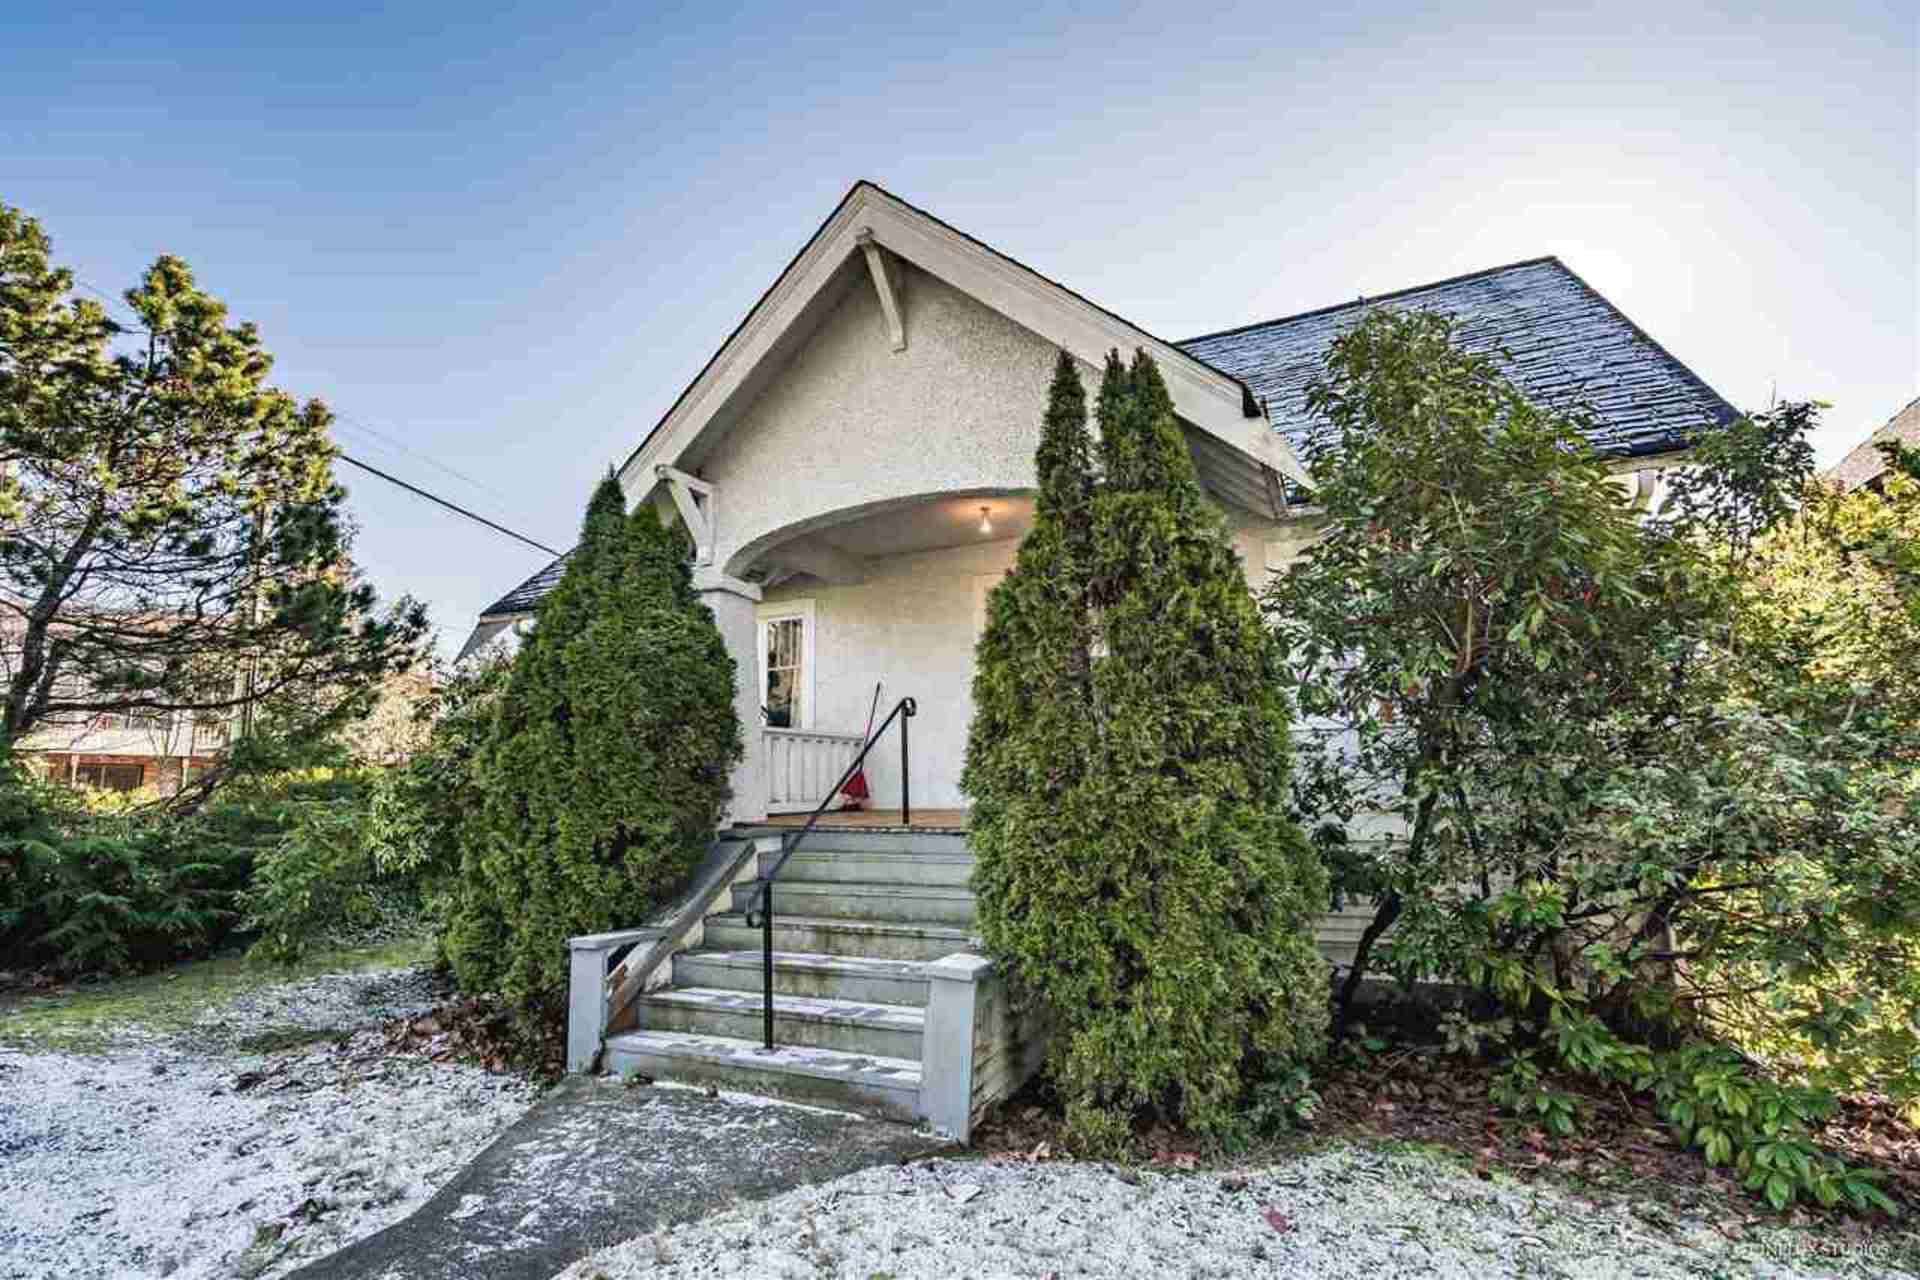 3804-w-king-edward-avenue-dunbar-vancouver-west-04 at 3804 W King Edward Avenue, Dunbar, Vancouver West